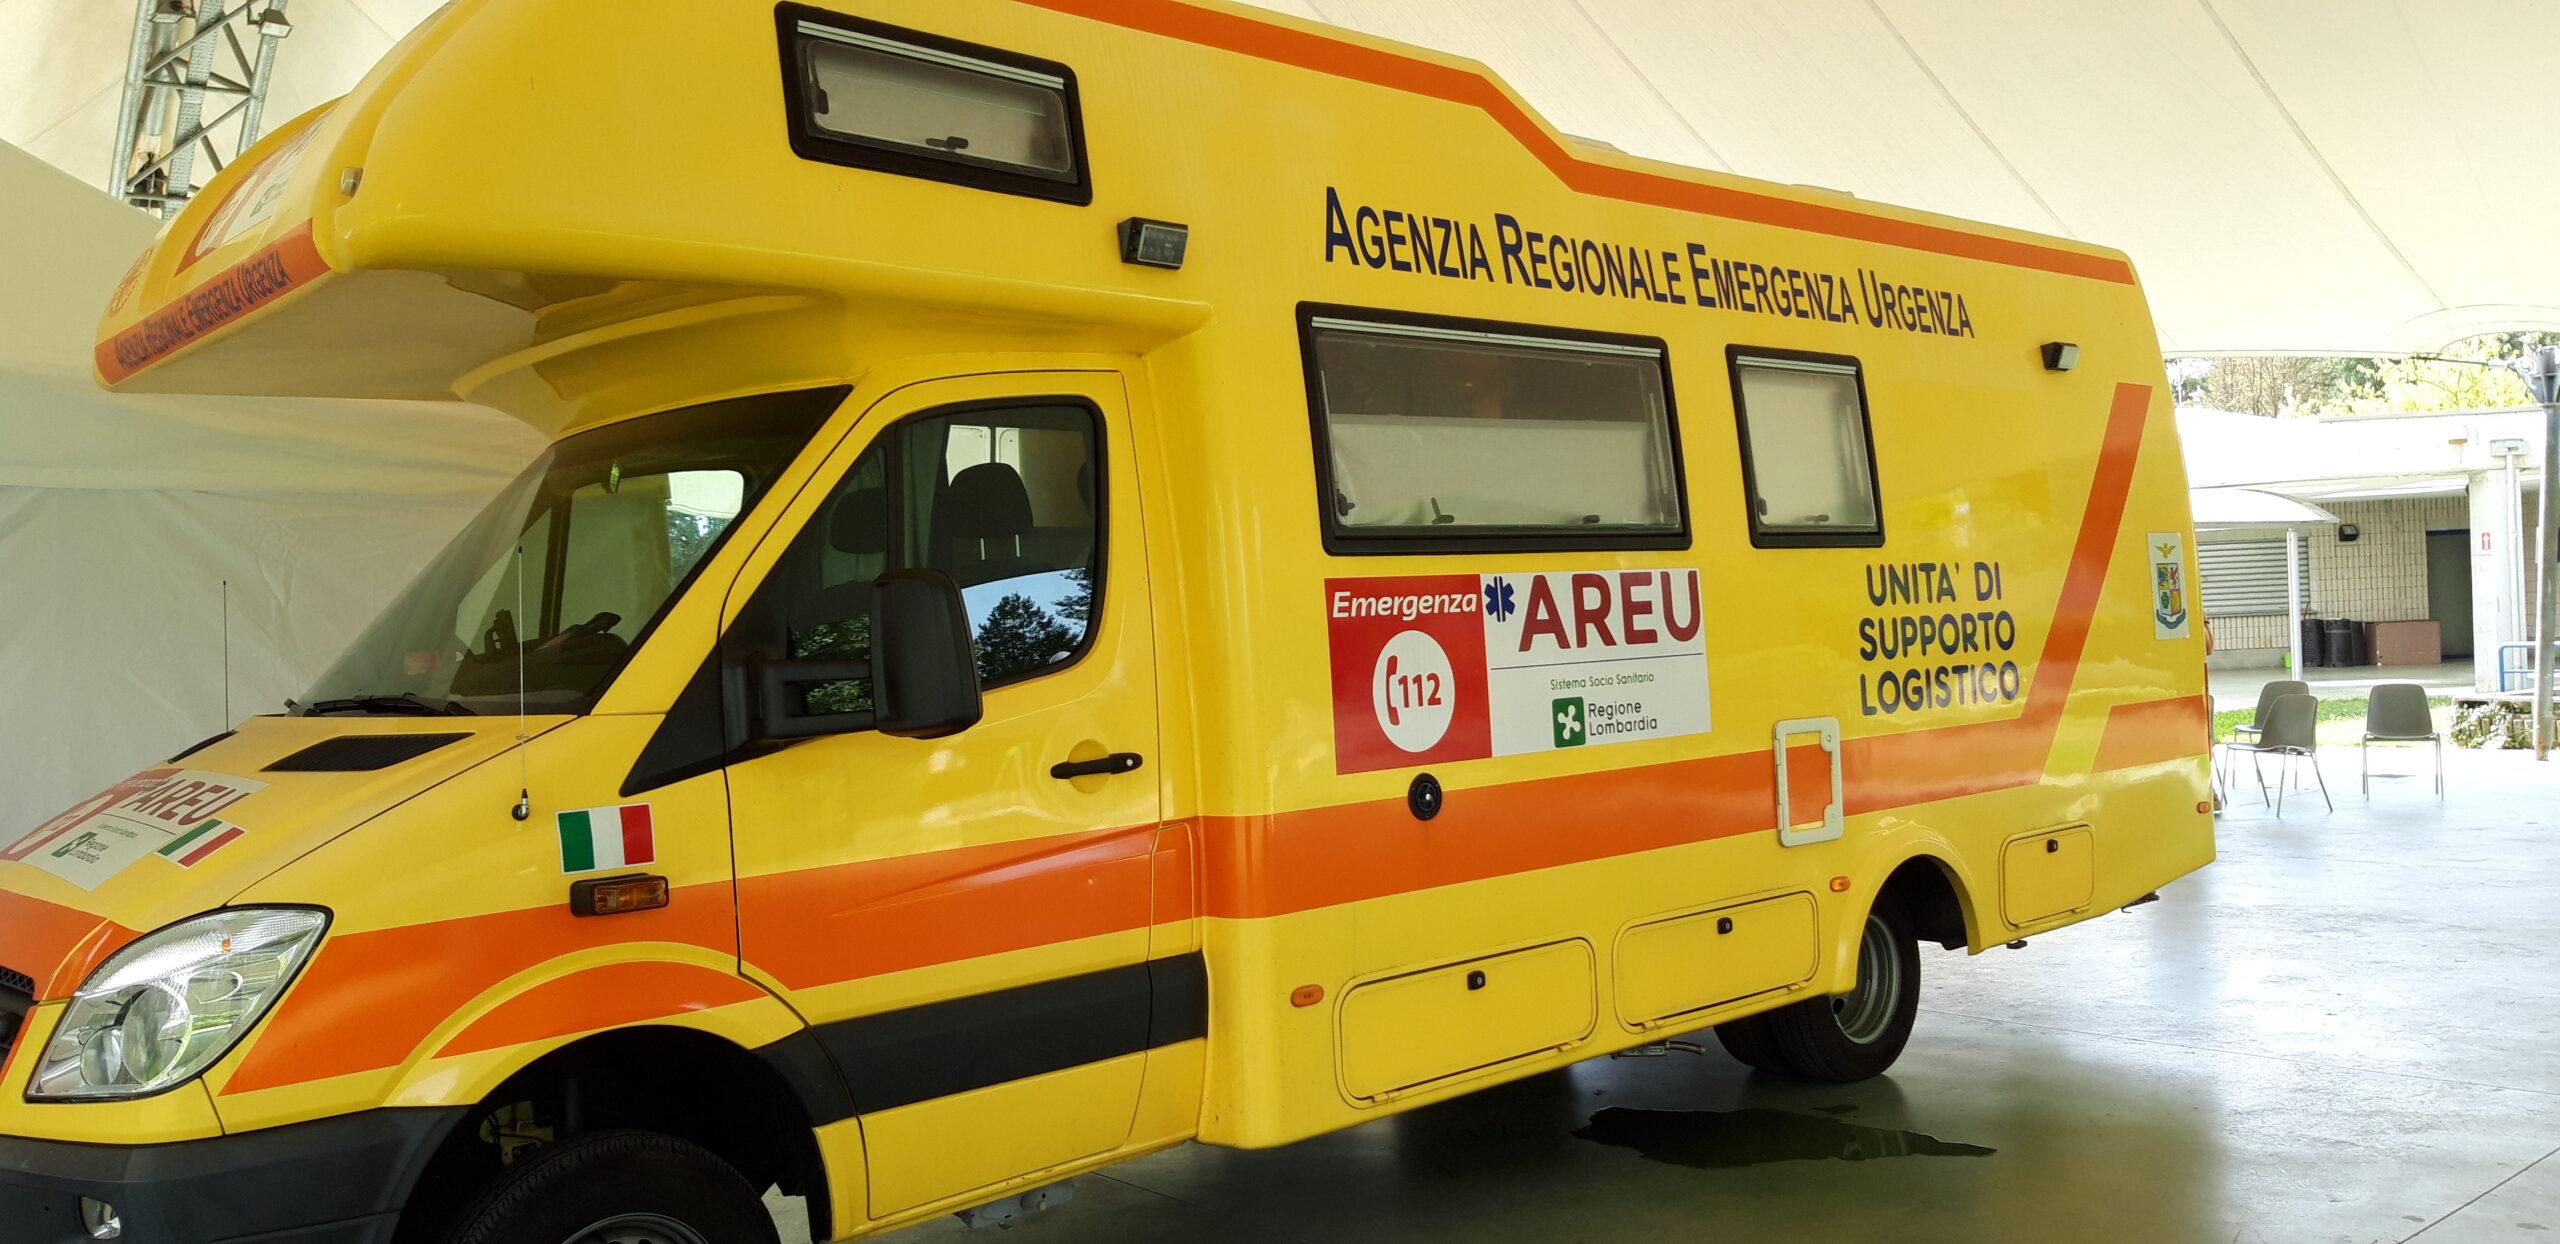 unità vaccinale mobile areu (6)